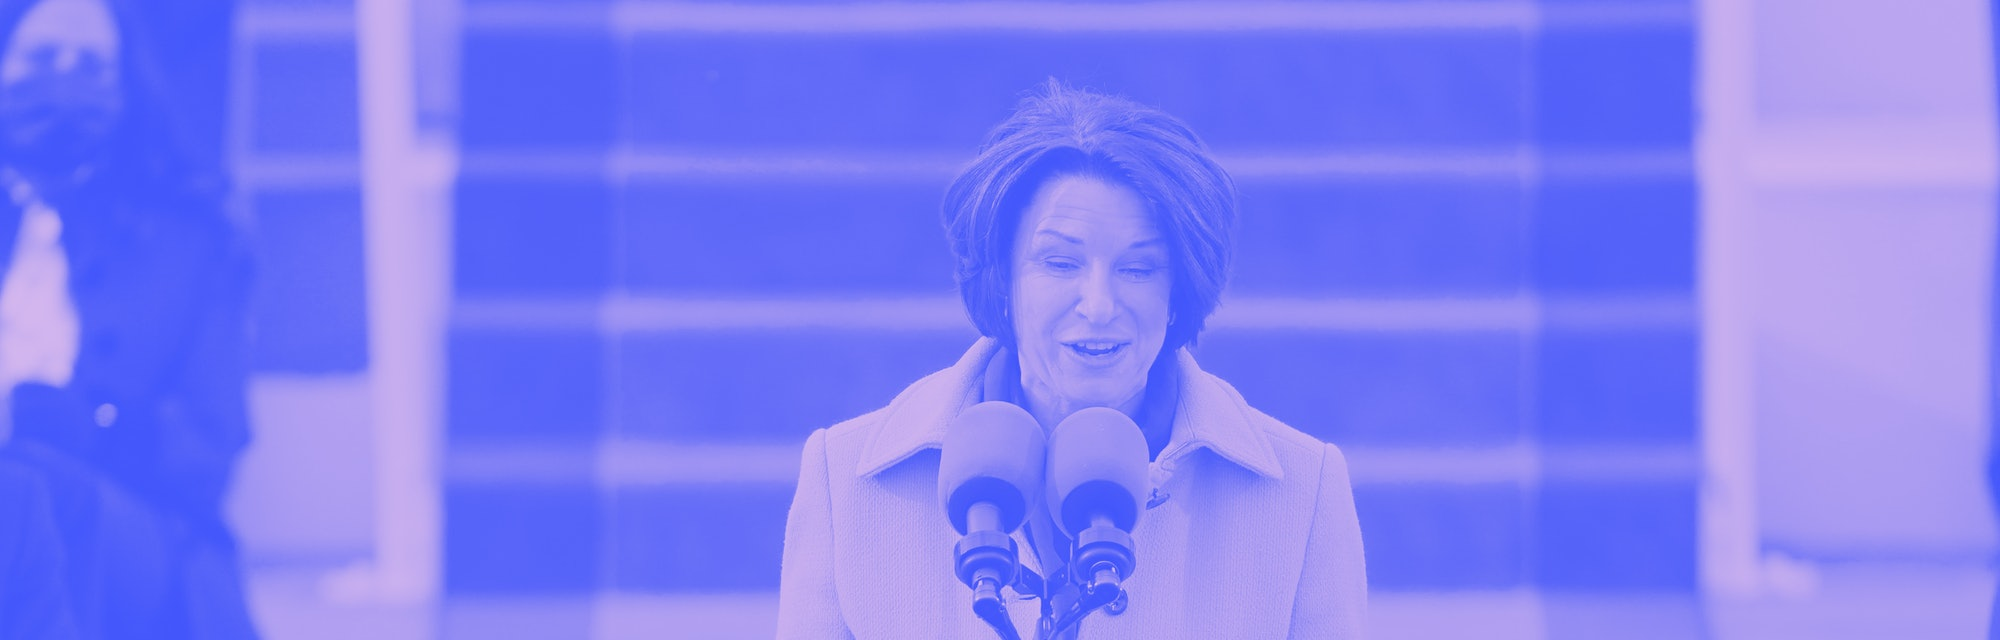 Democratic senator Amy Klobuchar is seen at a podium on Inauguration Day.